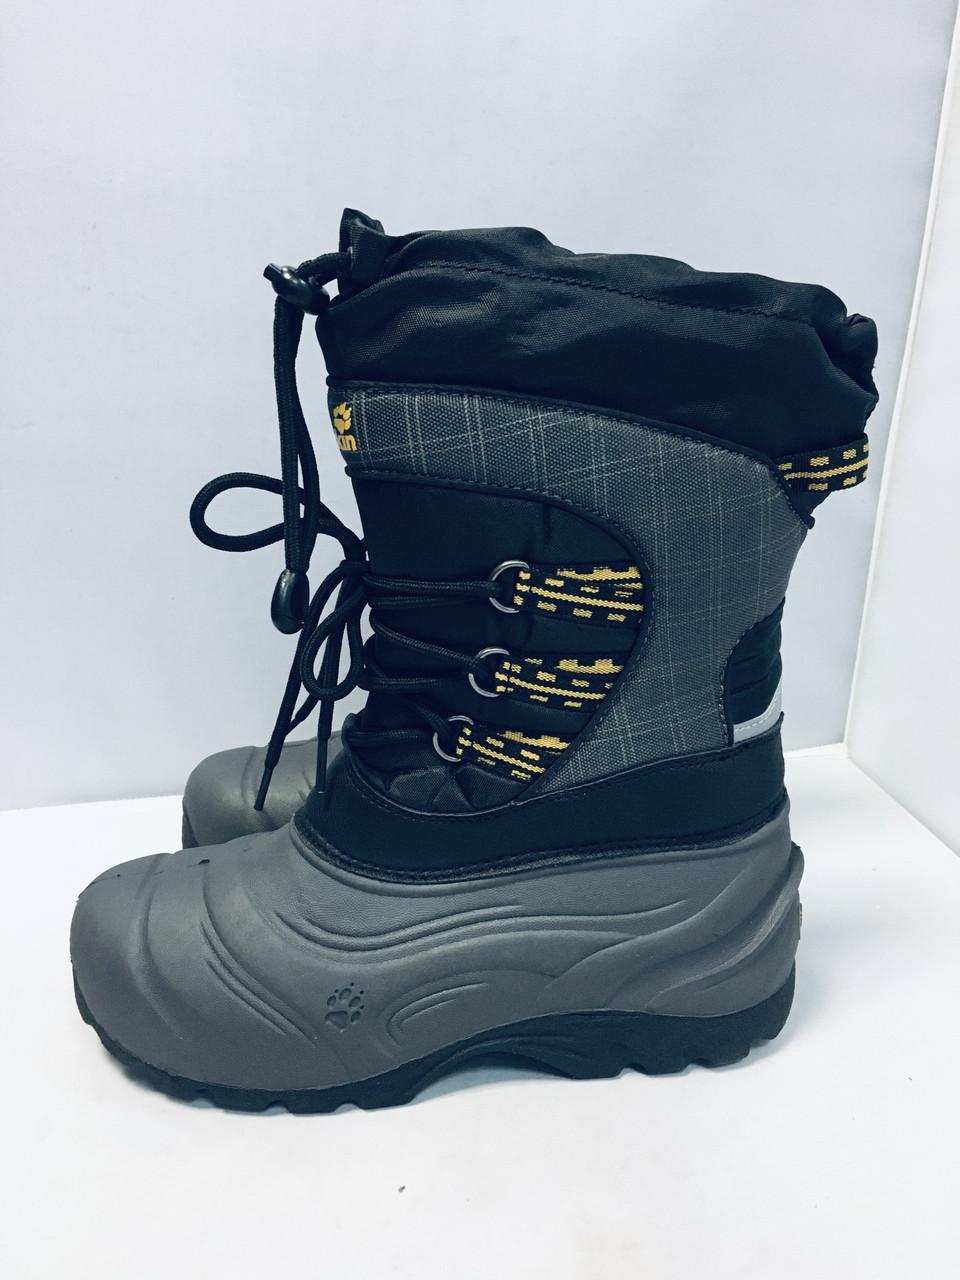 Зимние ботинки Jack Wolfskin, 35размер